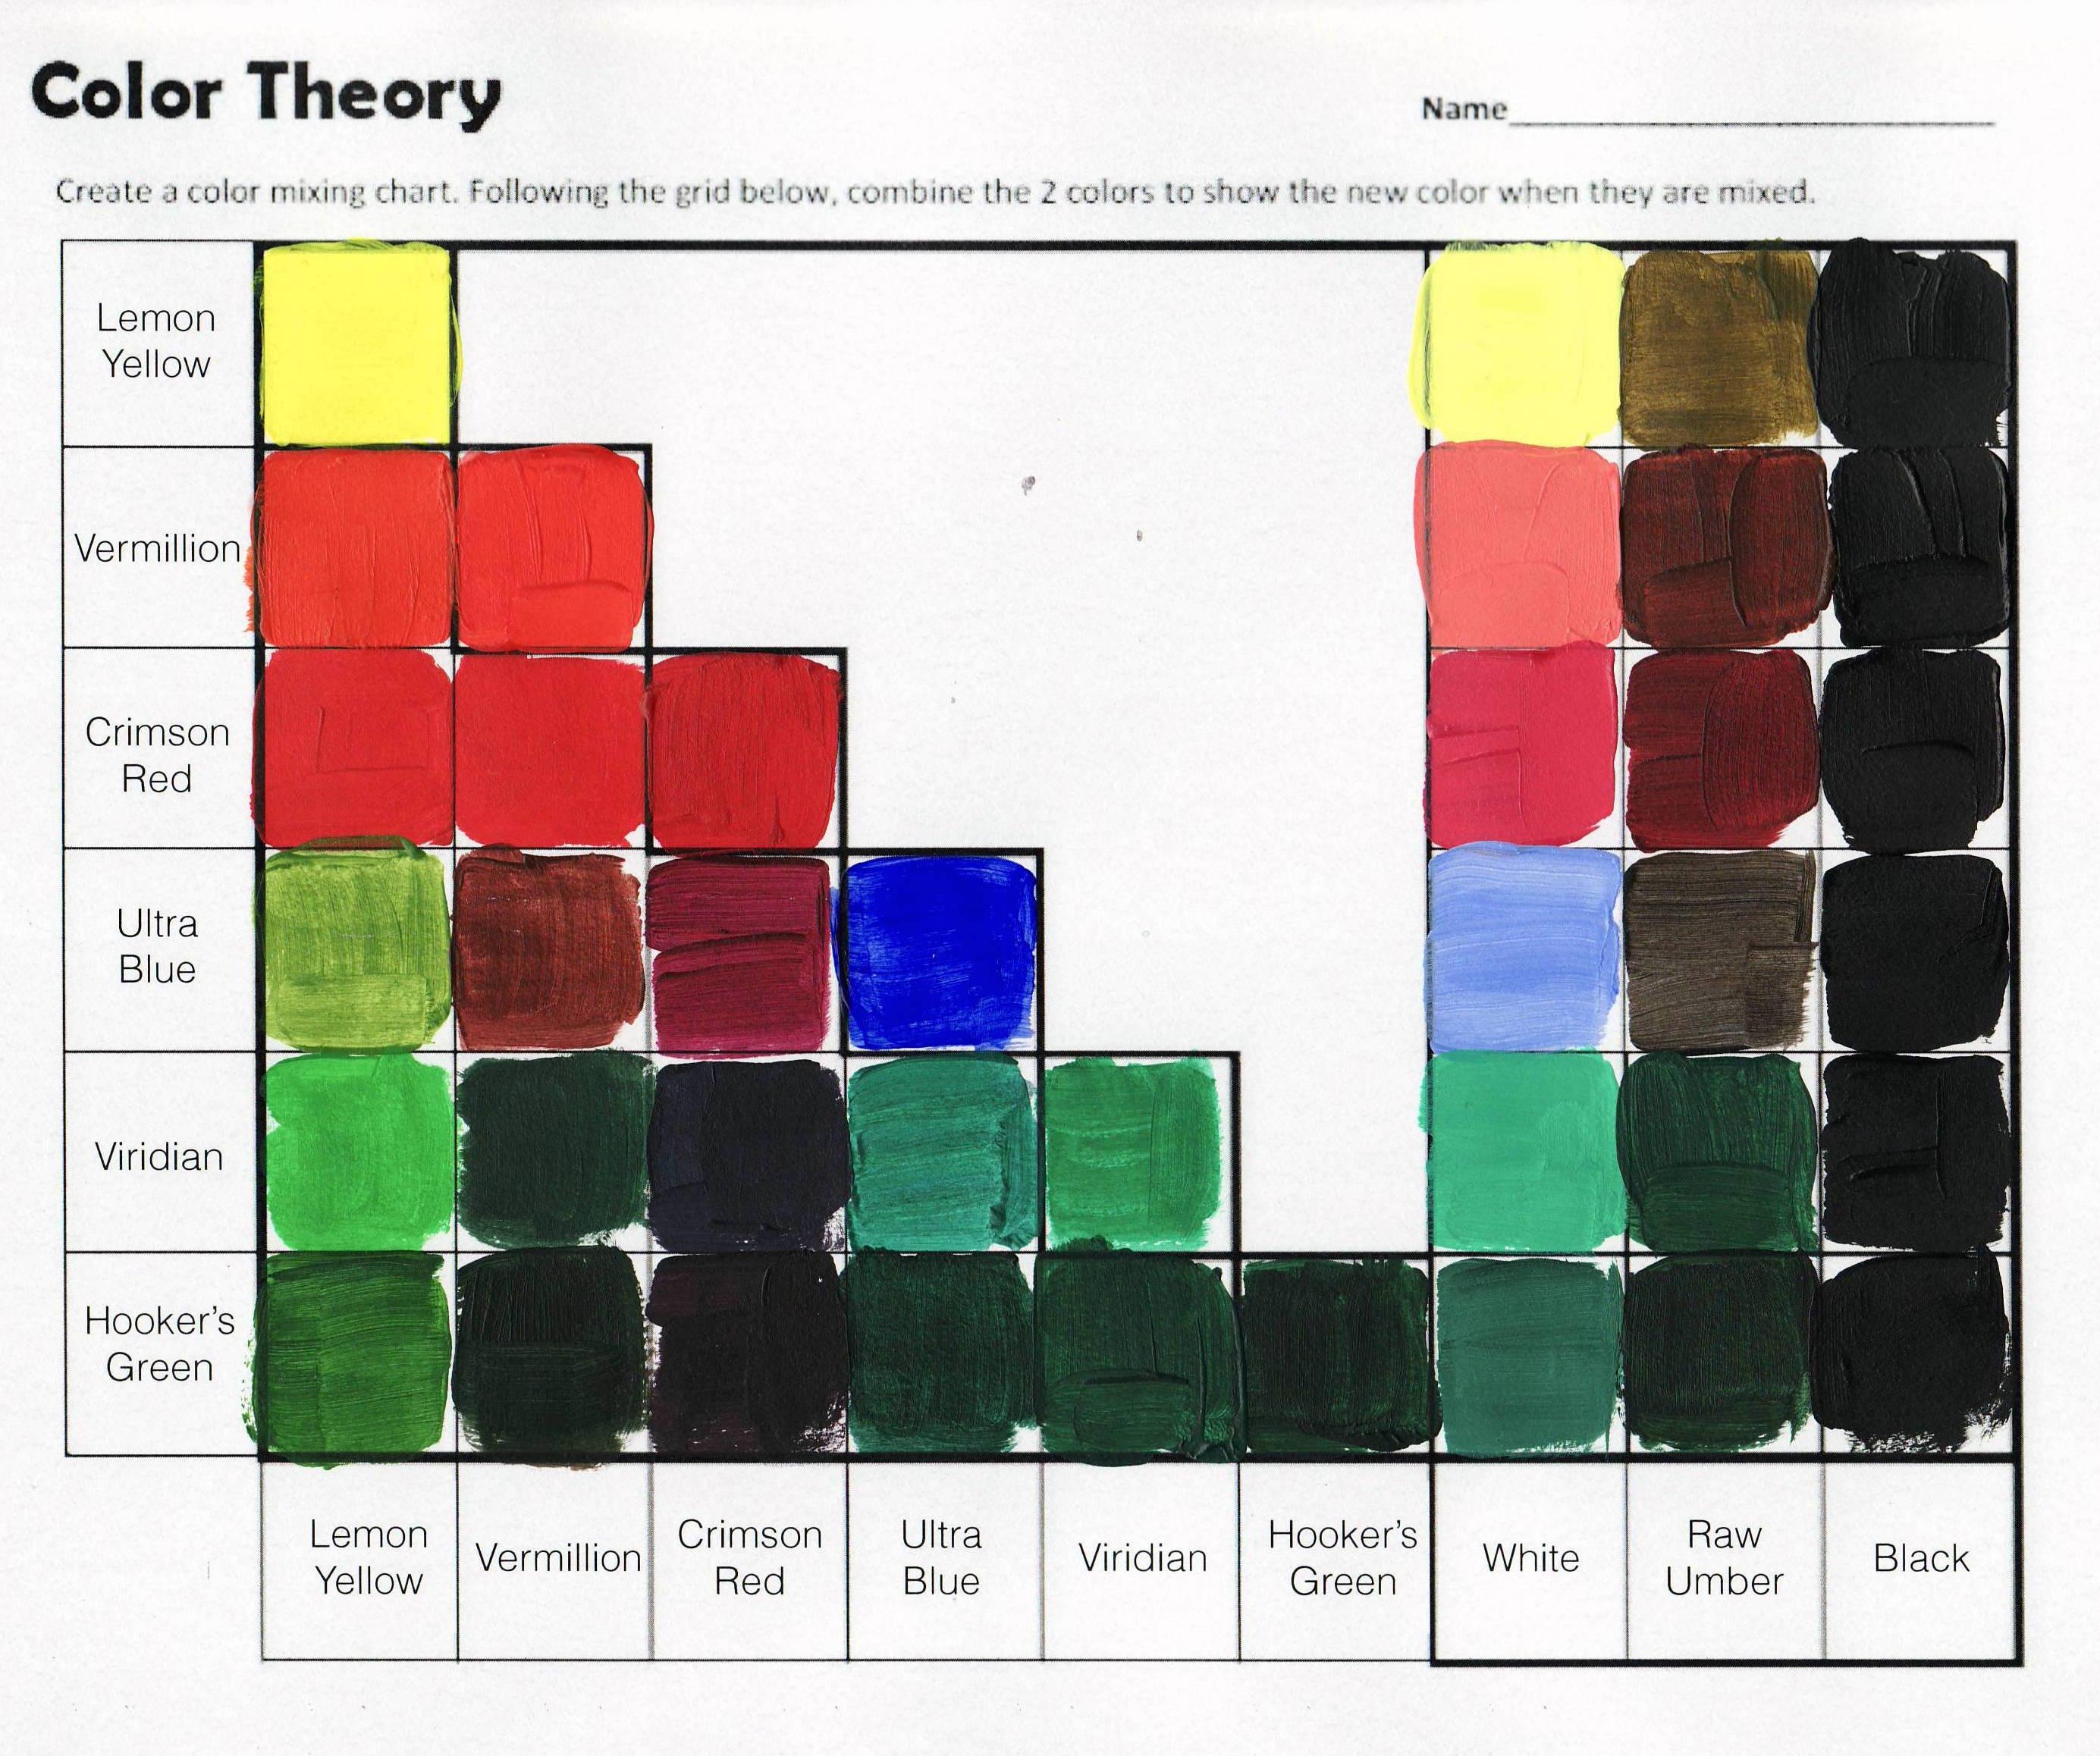 Color Theory Worksheet Circumvoluted